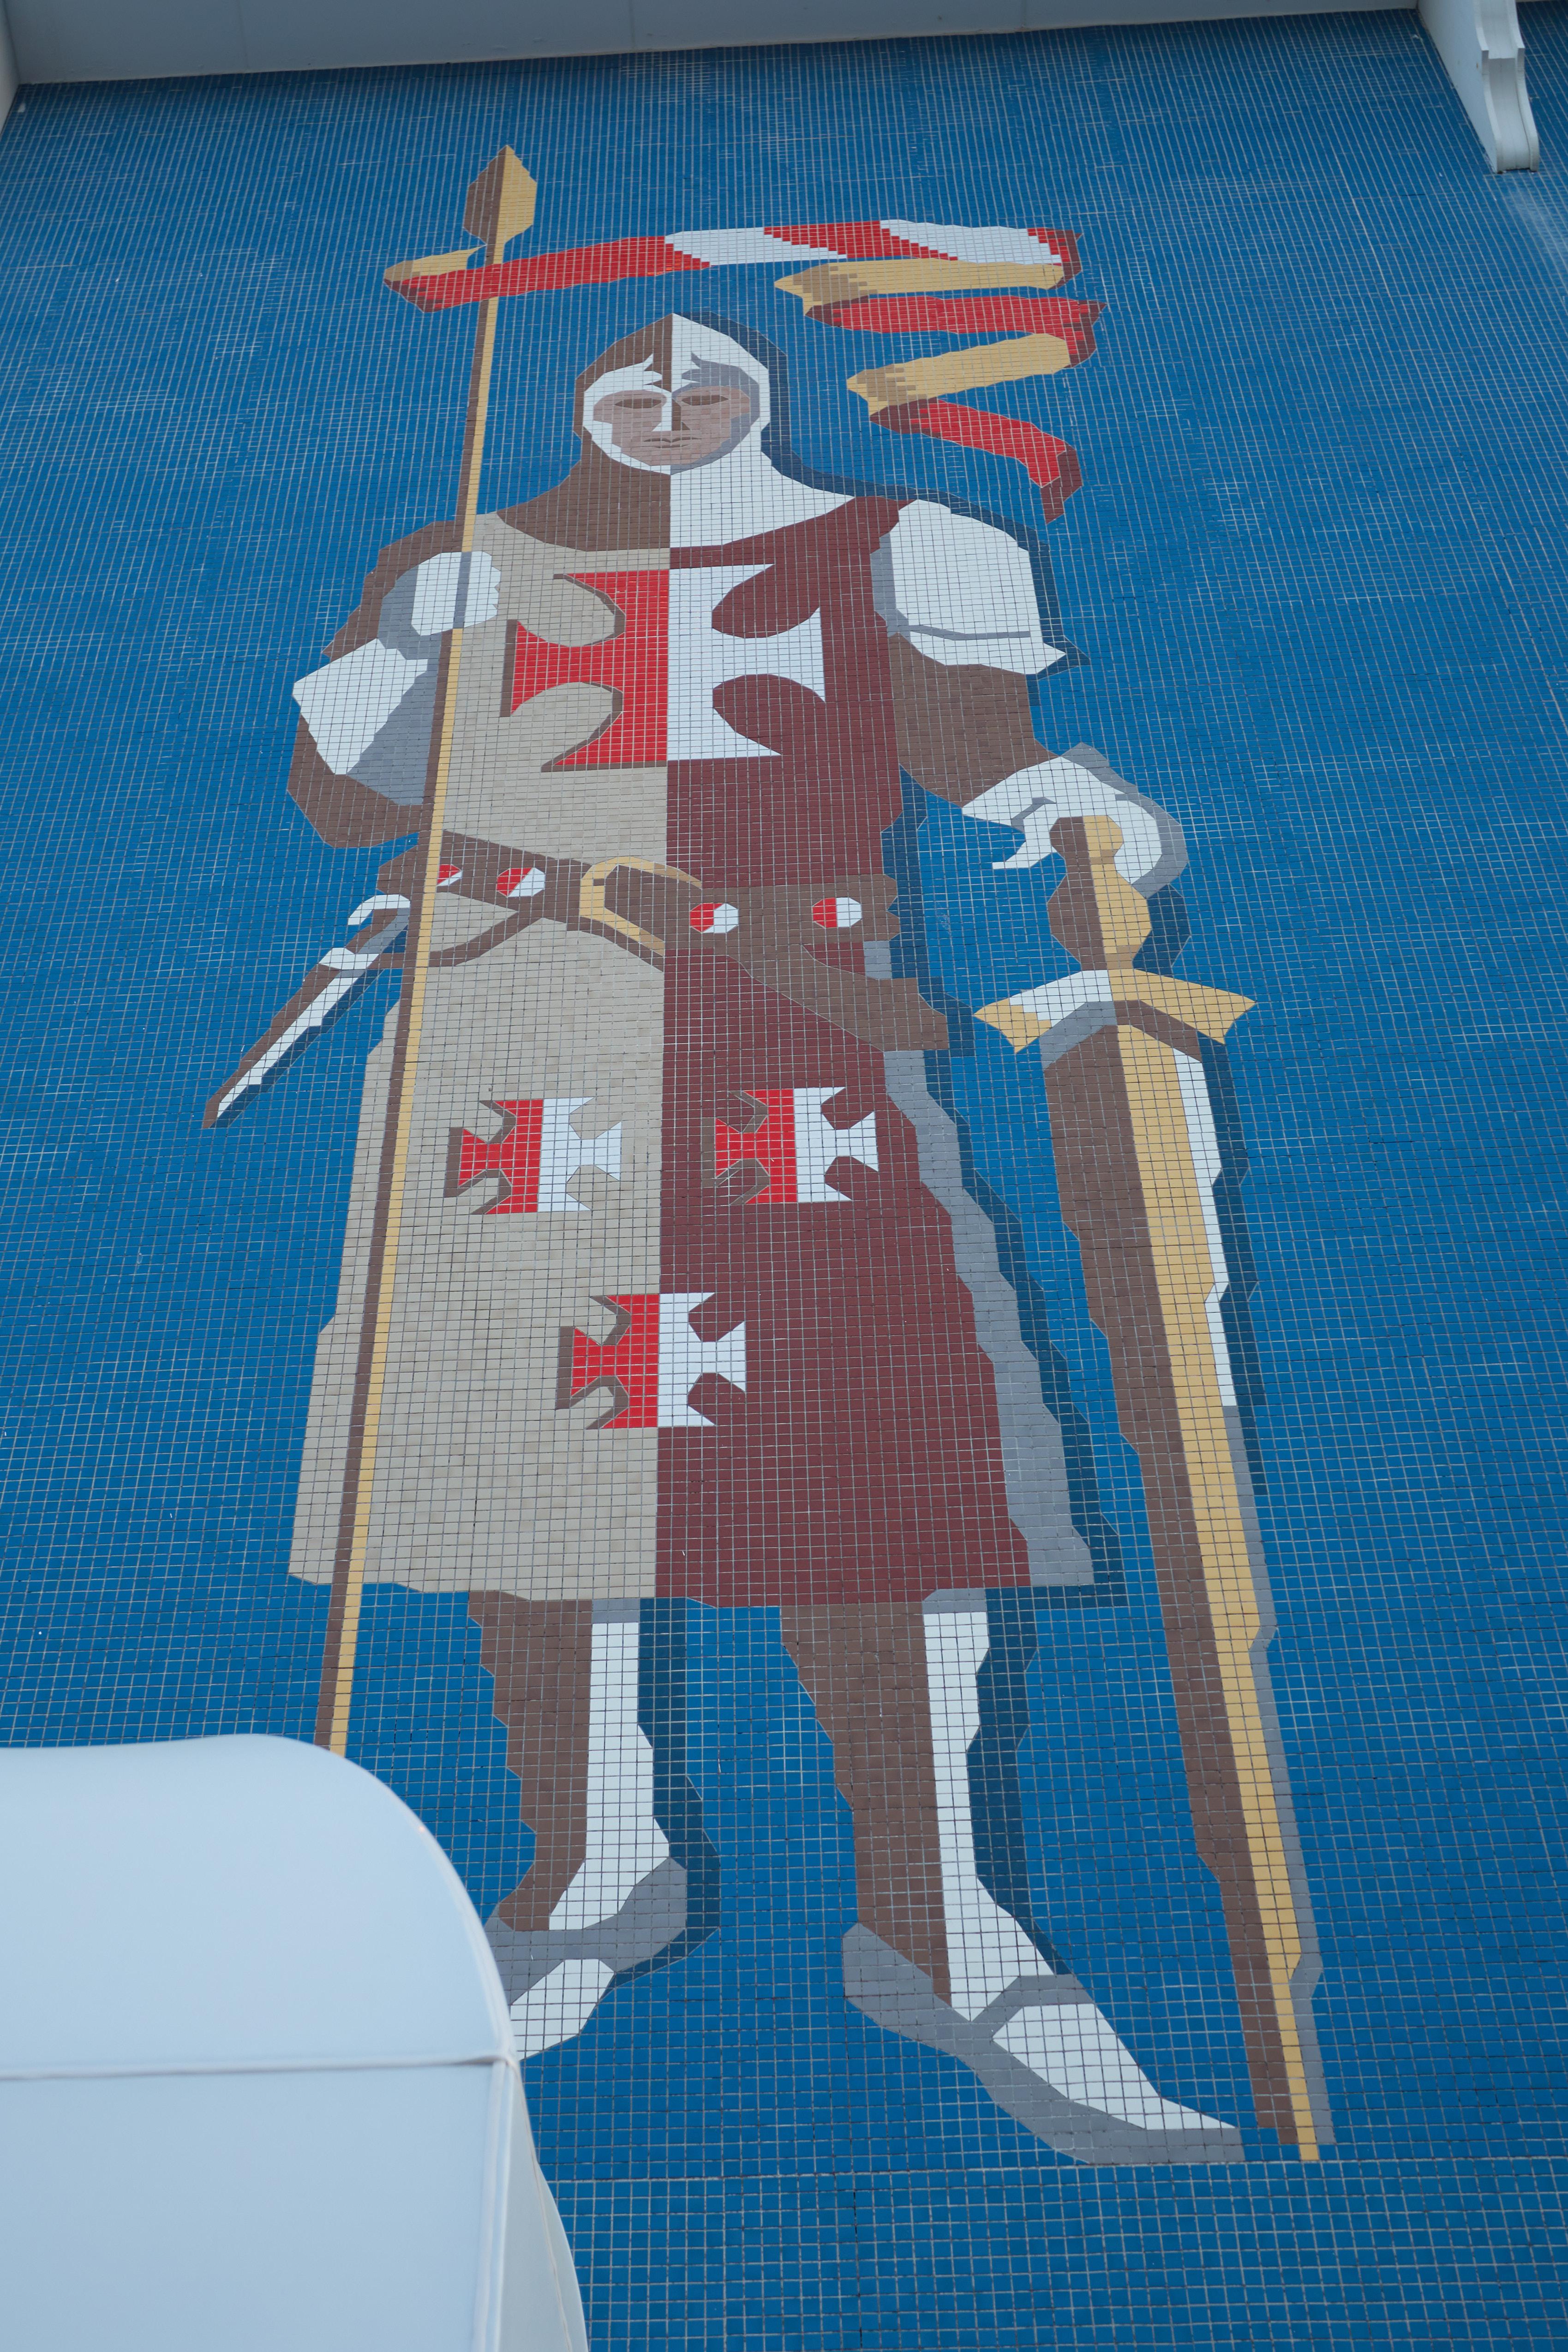 Tile Crusader knight on side of building.